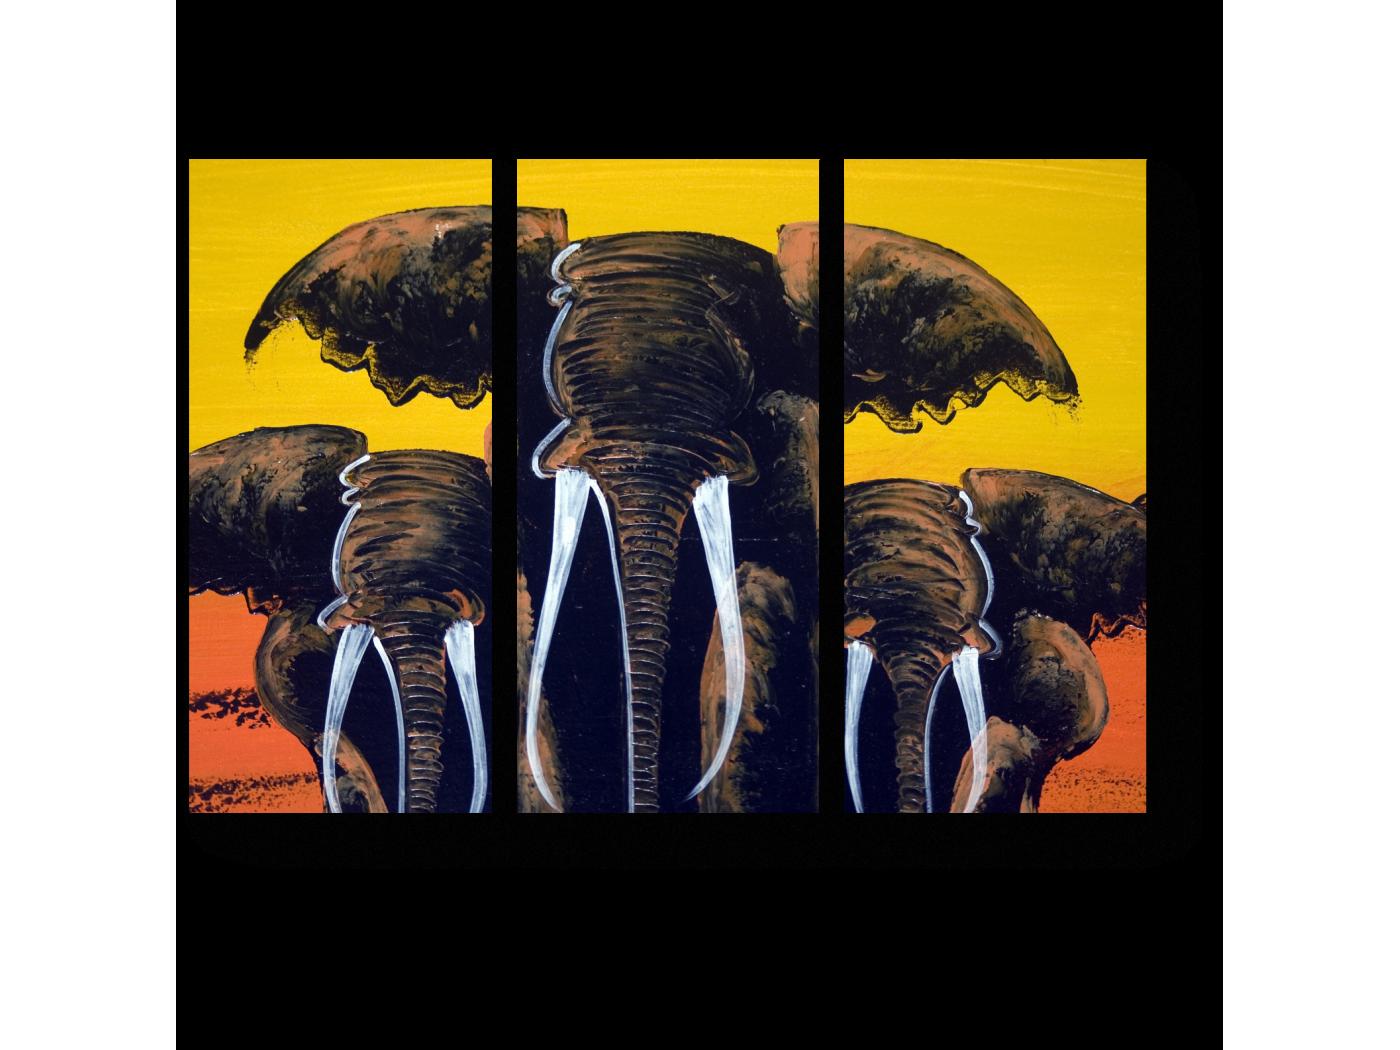 Модульная картина Могучее трио слонов (60x43) фото